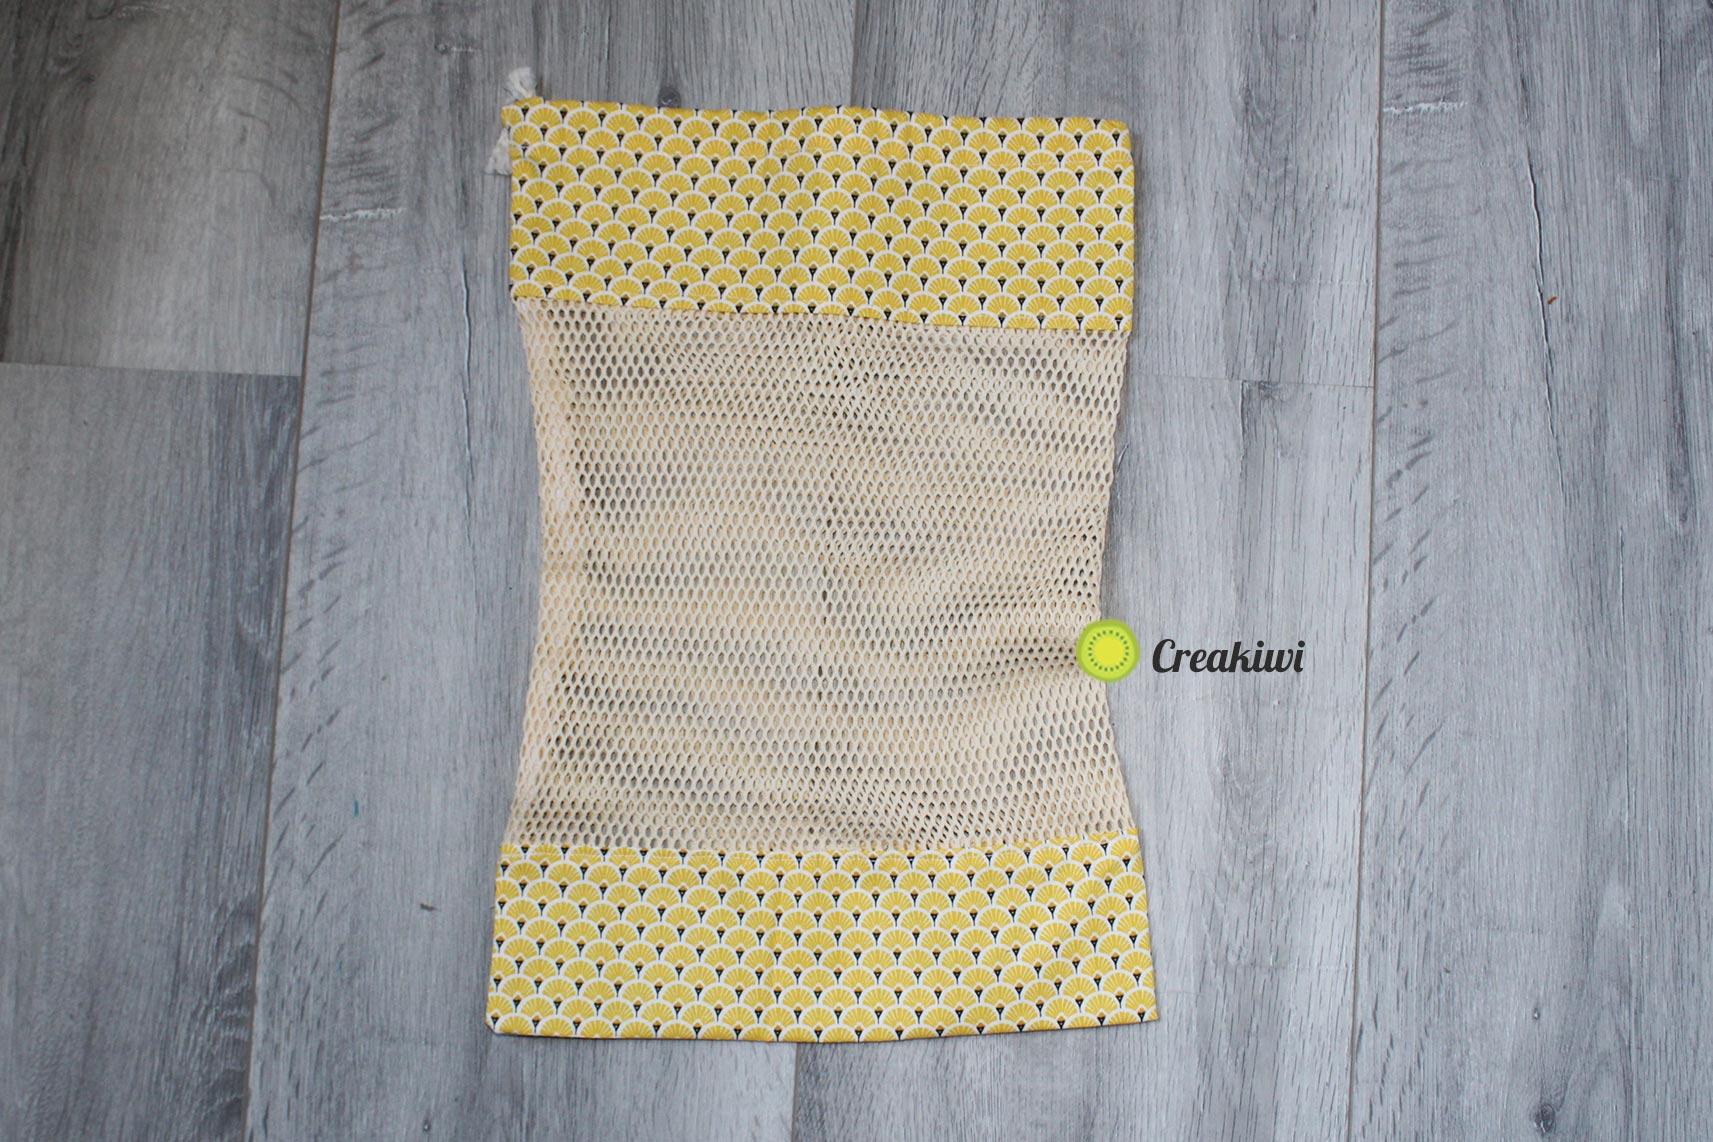 Sac à vrac jaune en filet bio Creakiwi produti zéro déchet